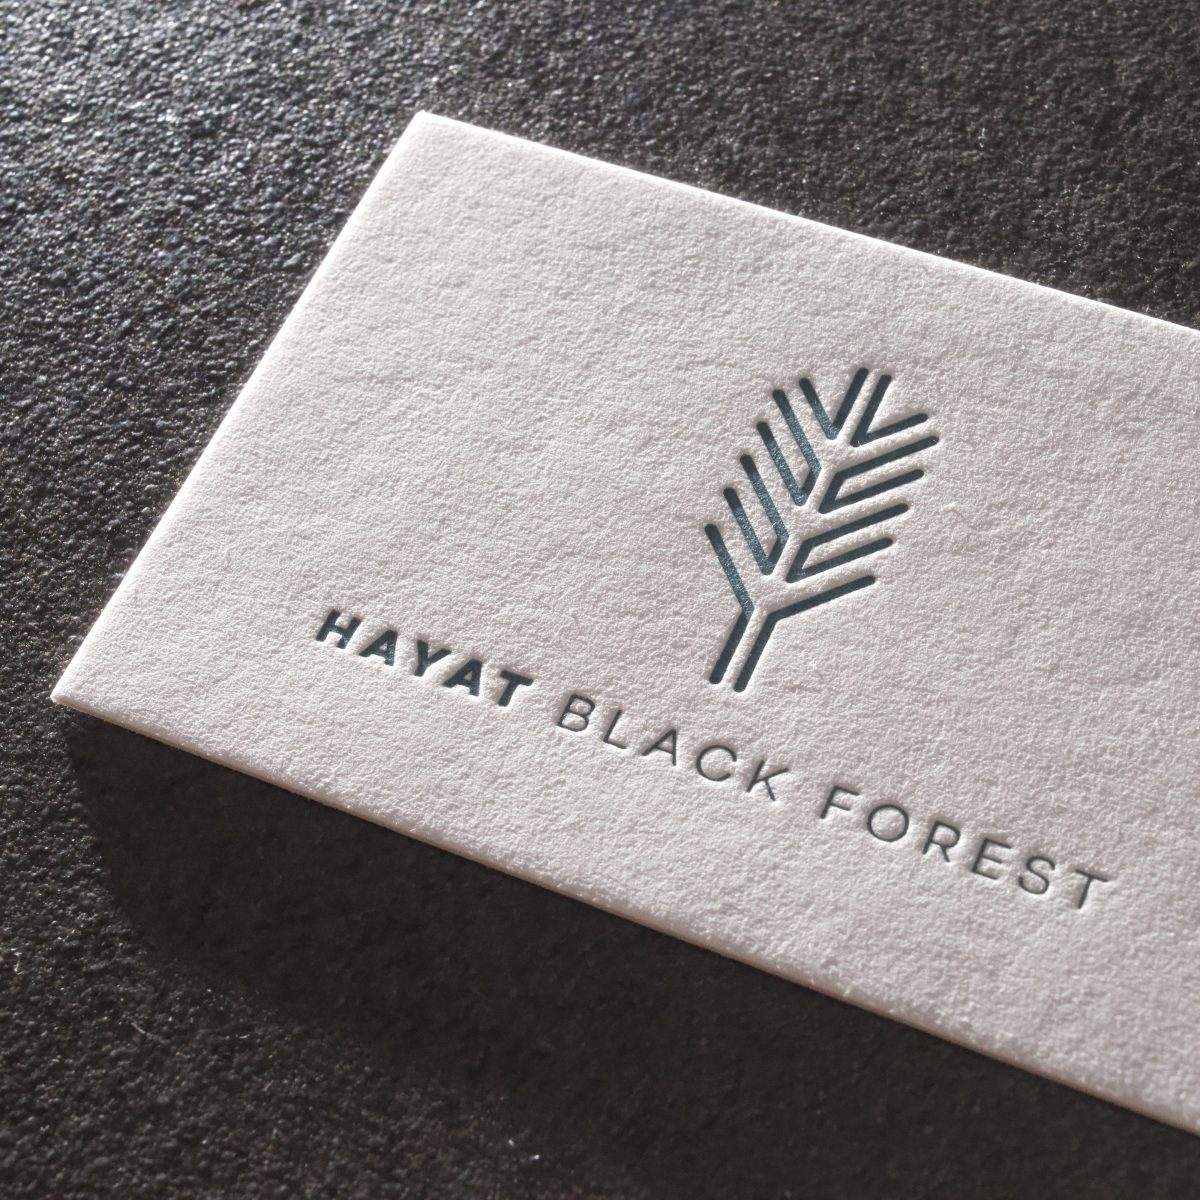 Visitenkarten Im Letterpress Verfahren Druckerei Butz Bürker